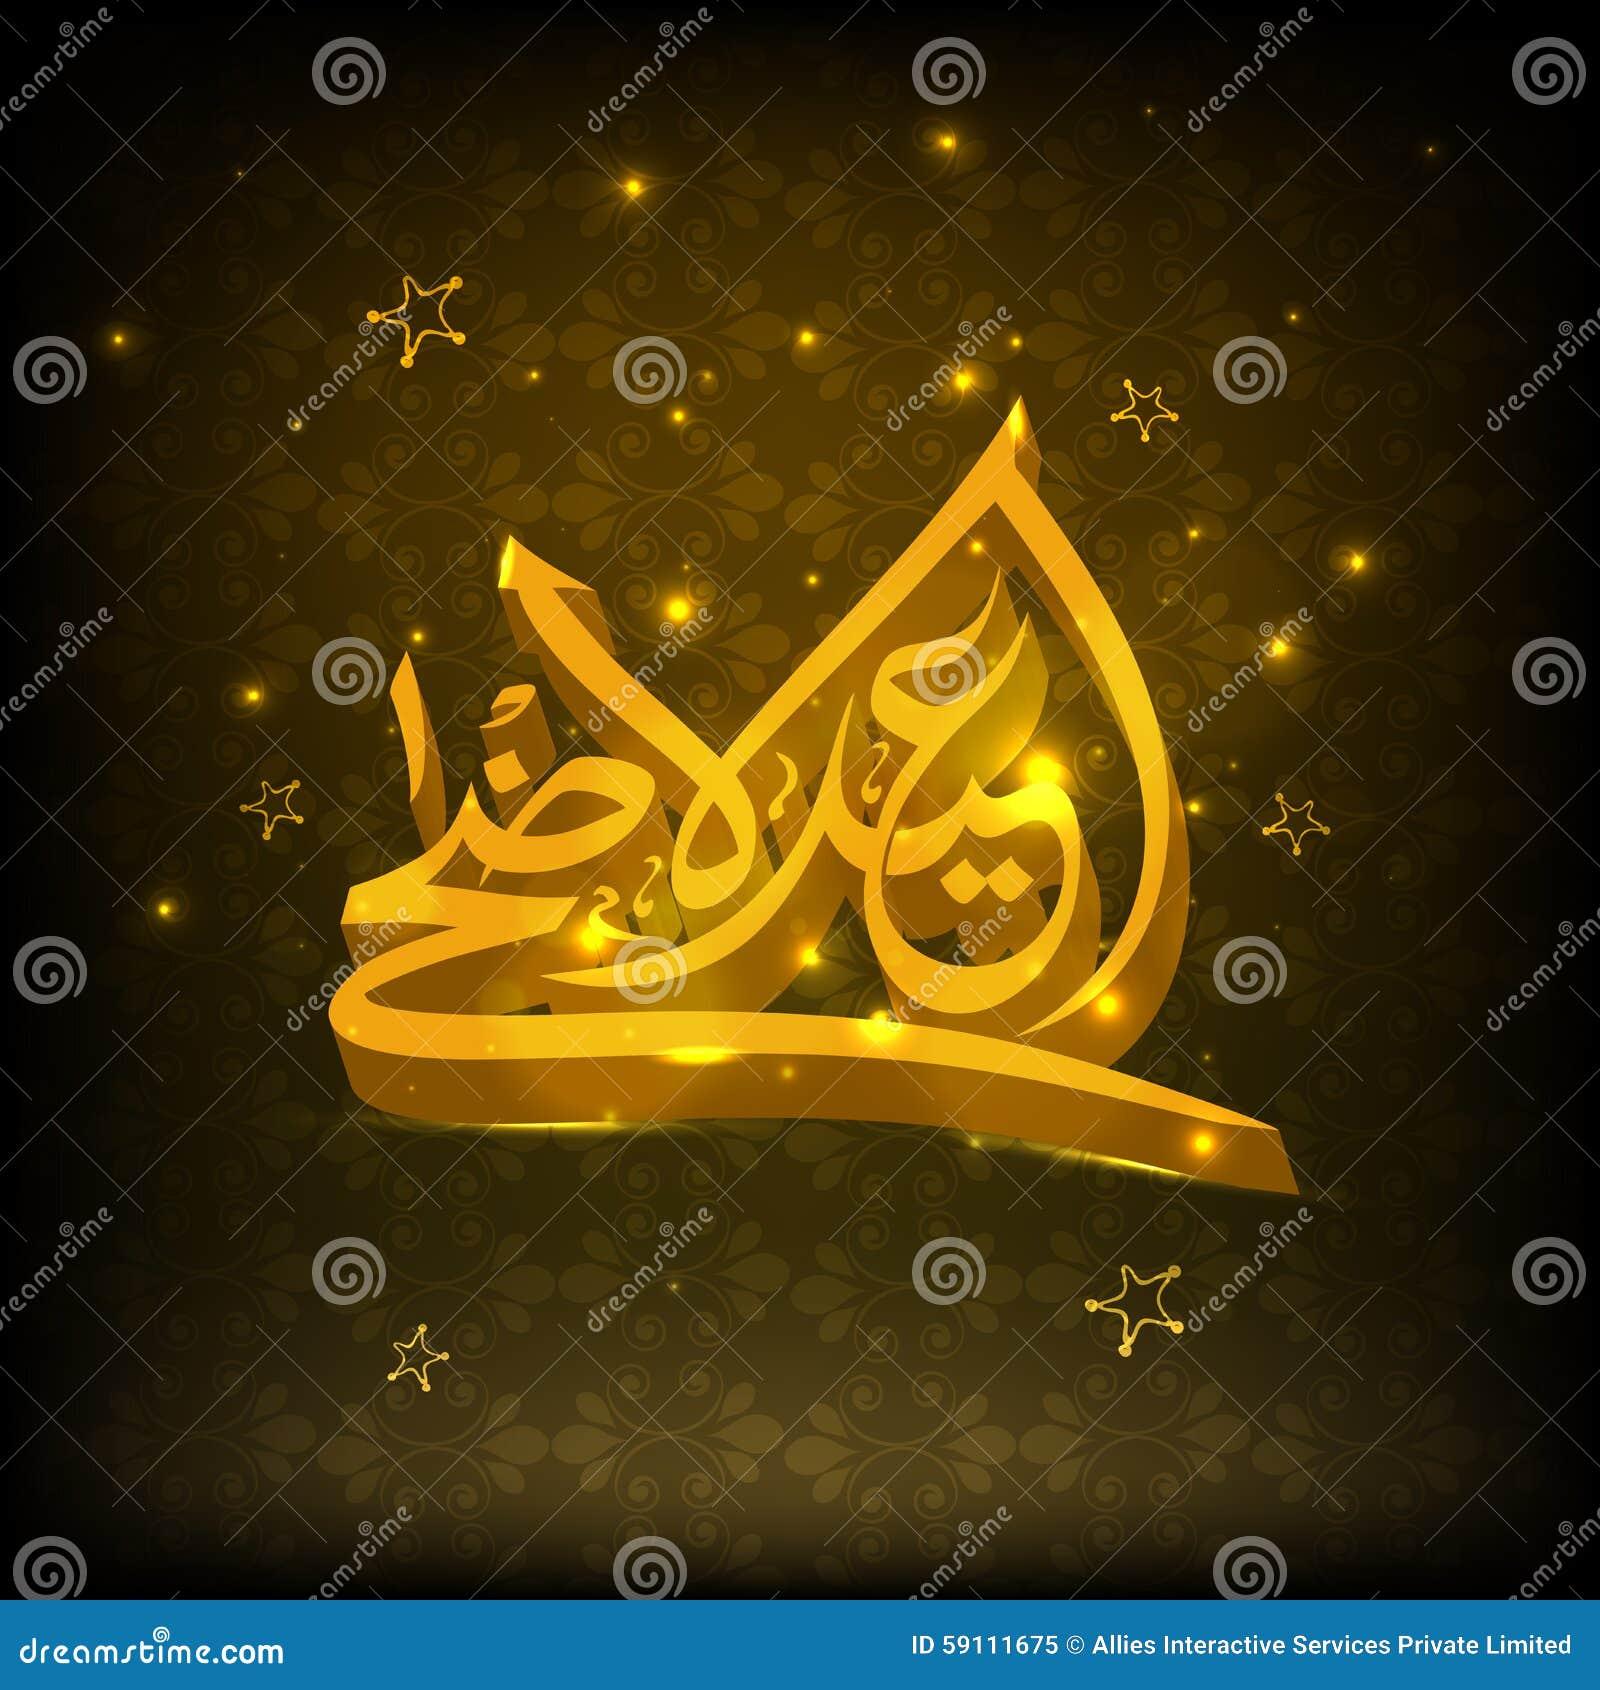 3d Arabic Calligraphy Text For Eid Al Adha Celebration